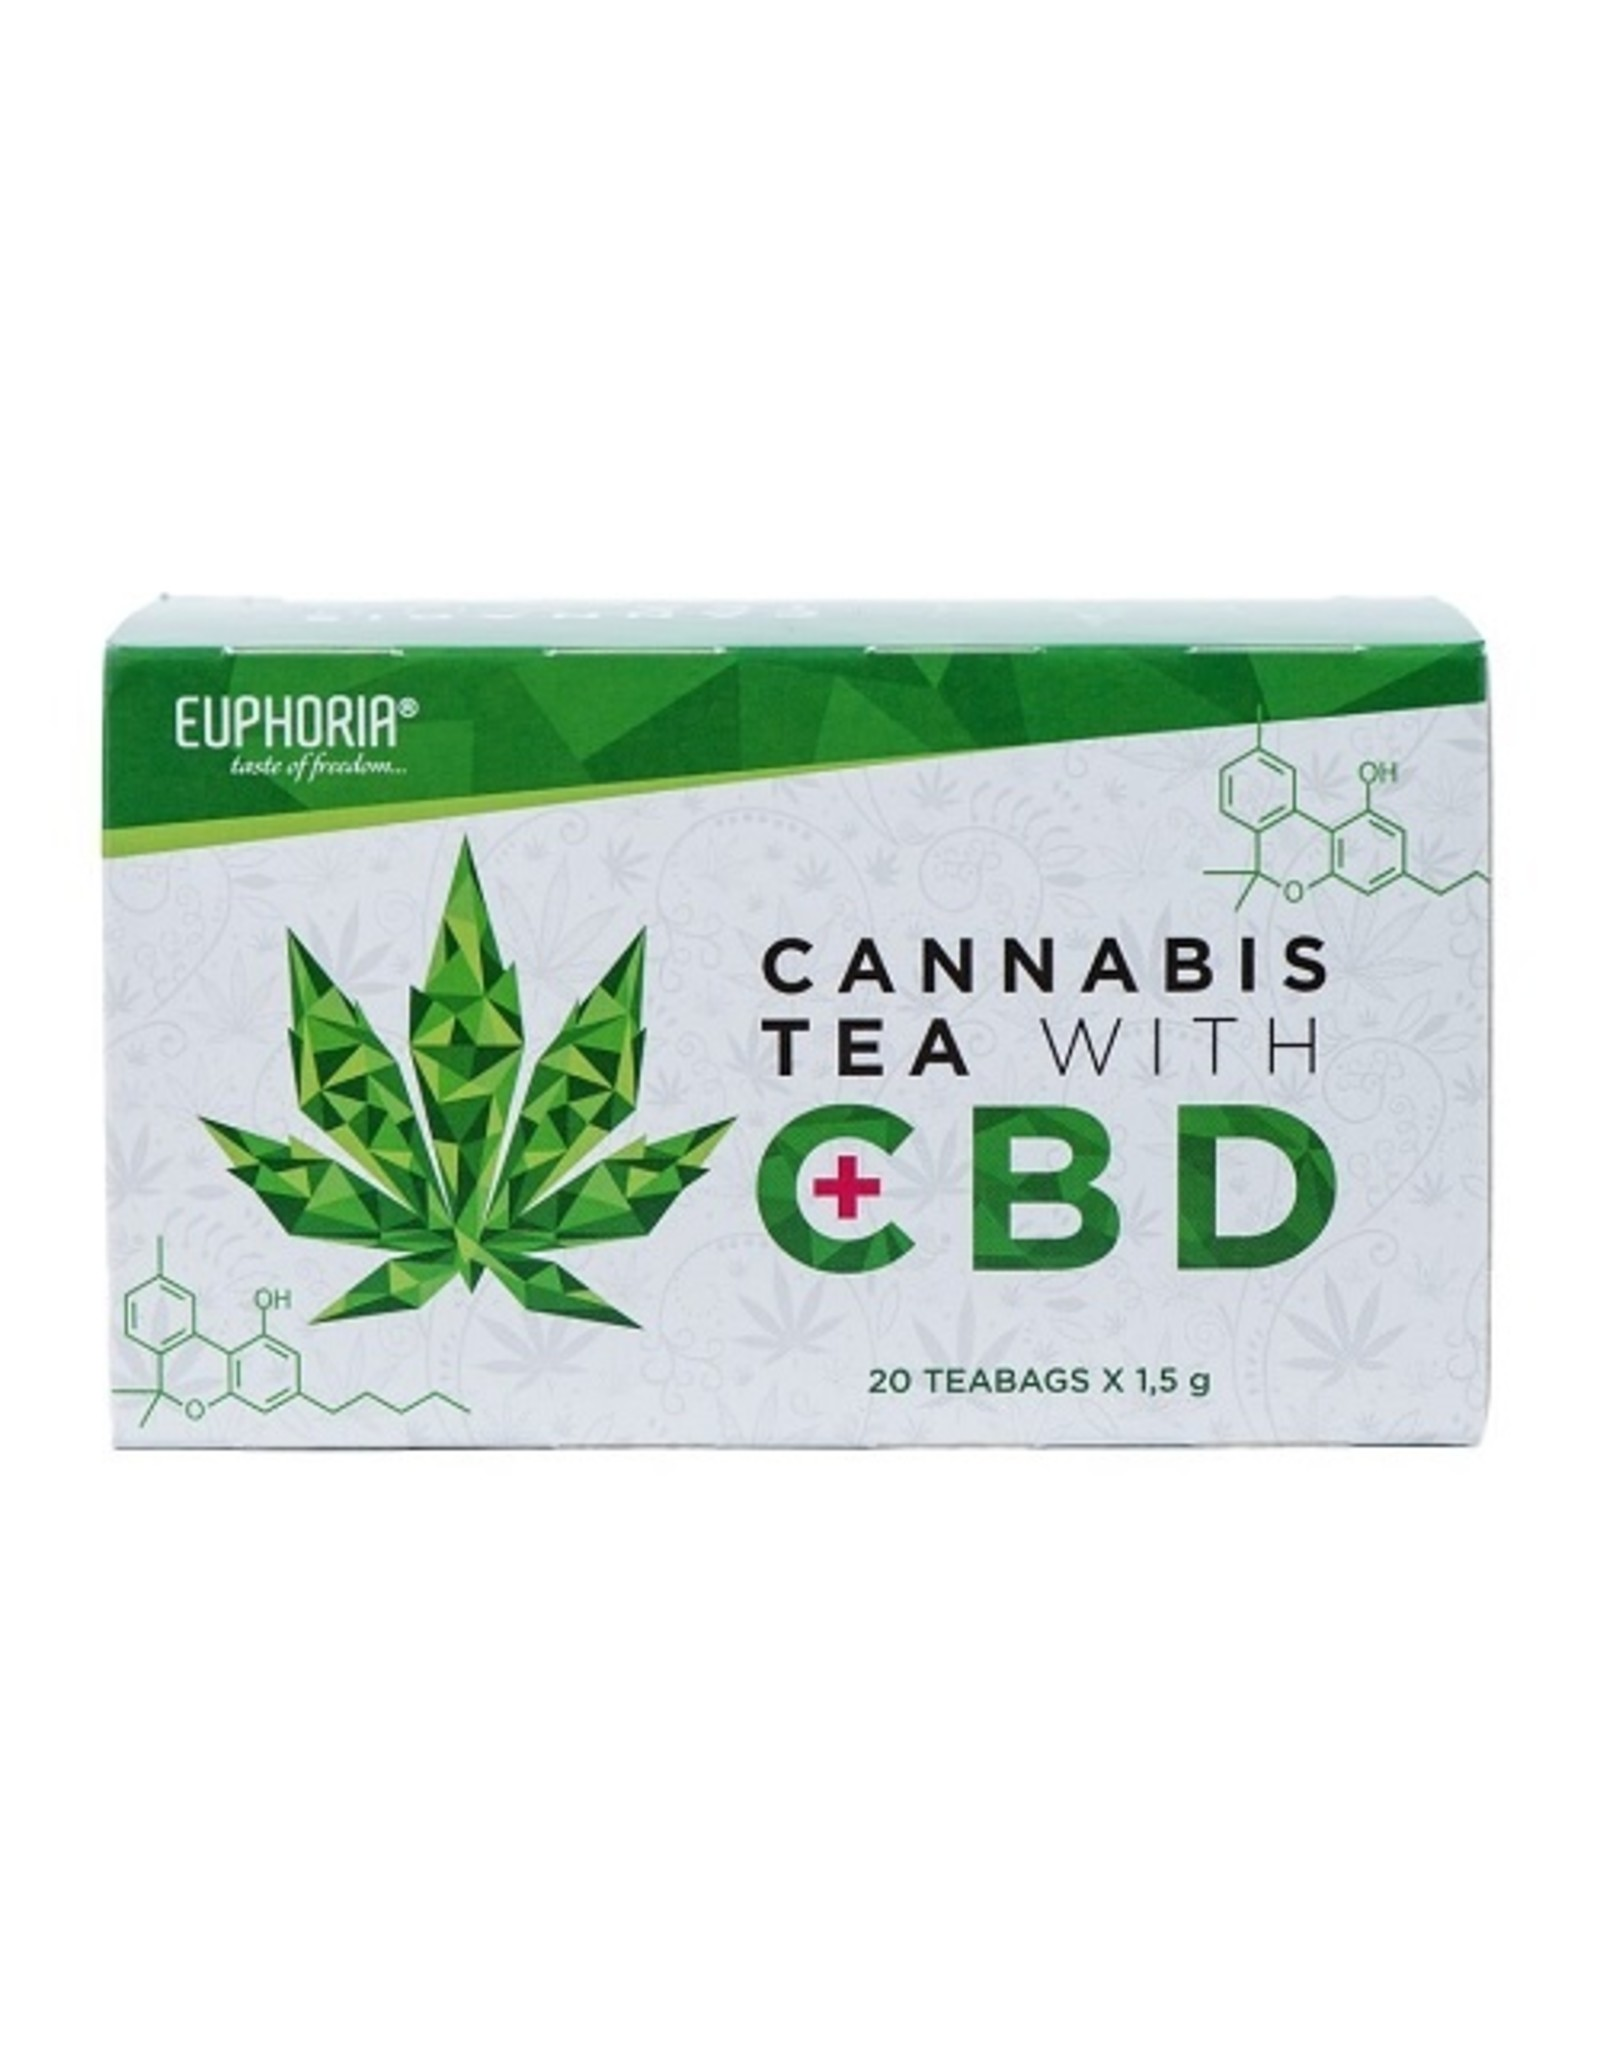 Euphoria Euphoria Cannabis CBD Tea